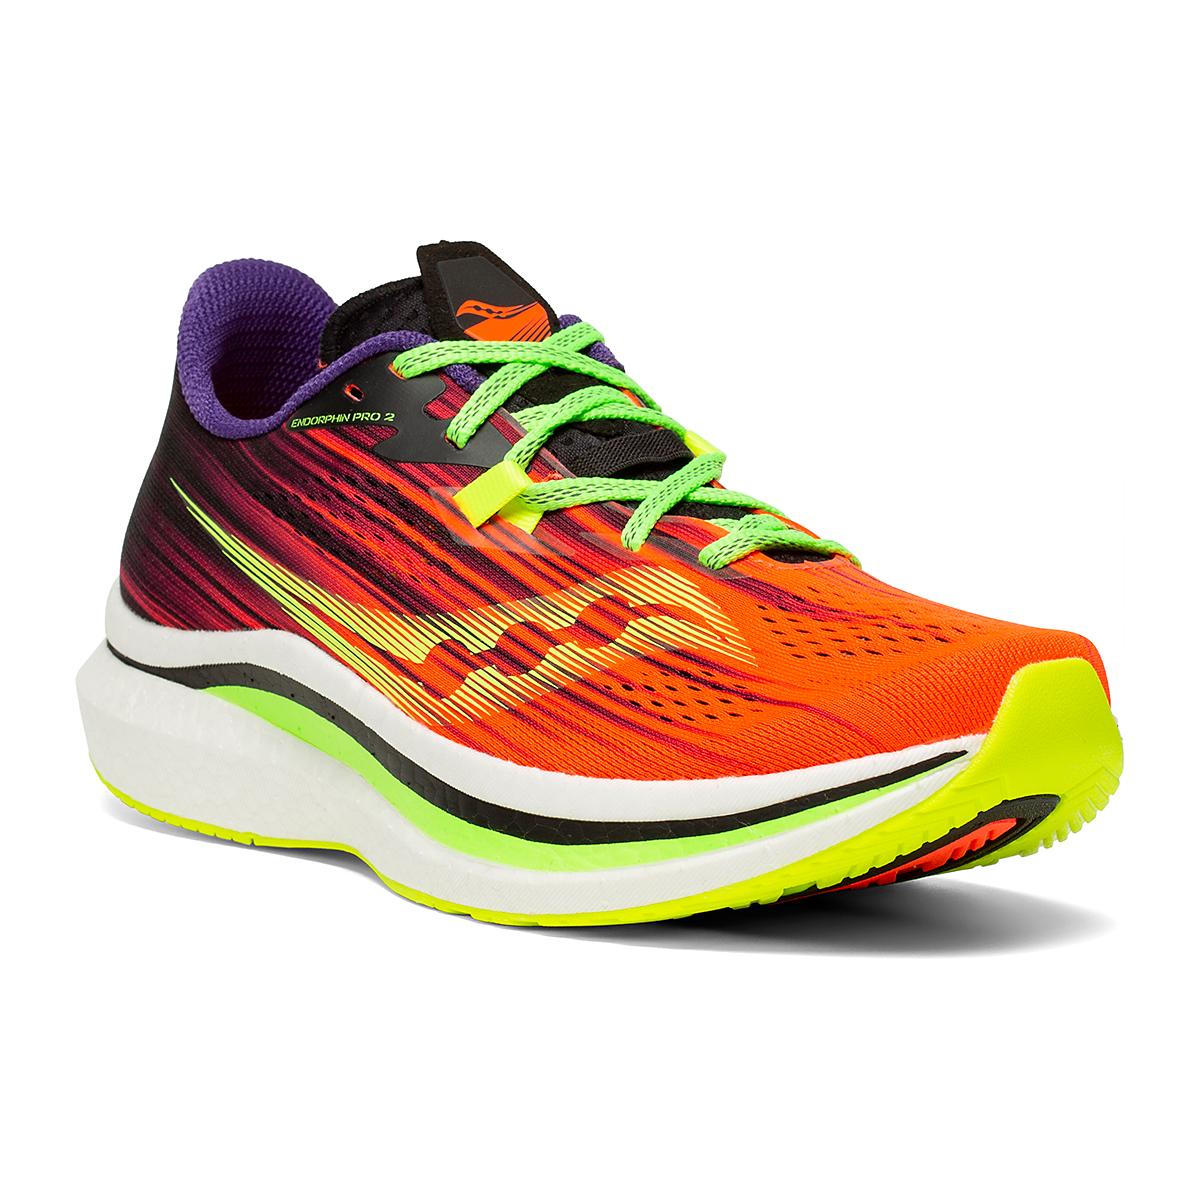 Men's Saucony Endorphin Pro 2 Running Shoe - Color: Vizipro - Size: 7 - Width: Regular, Vizipro, large, image 5